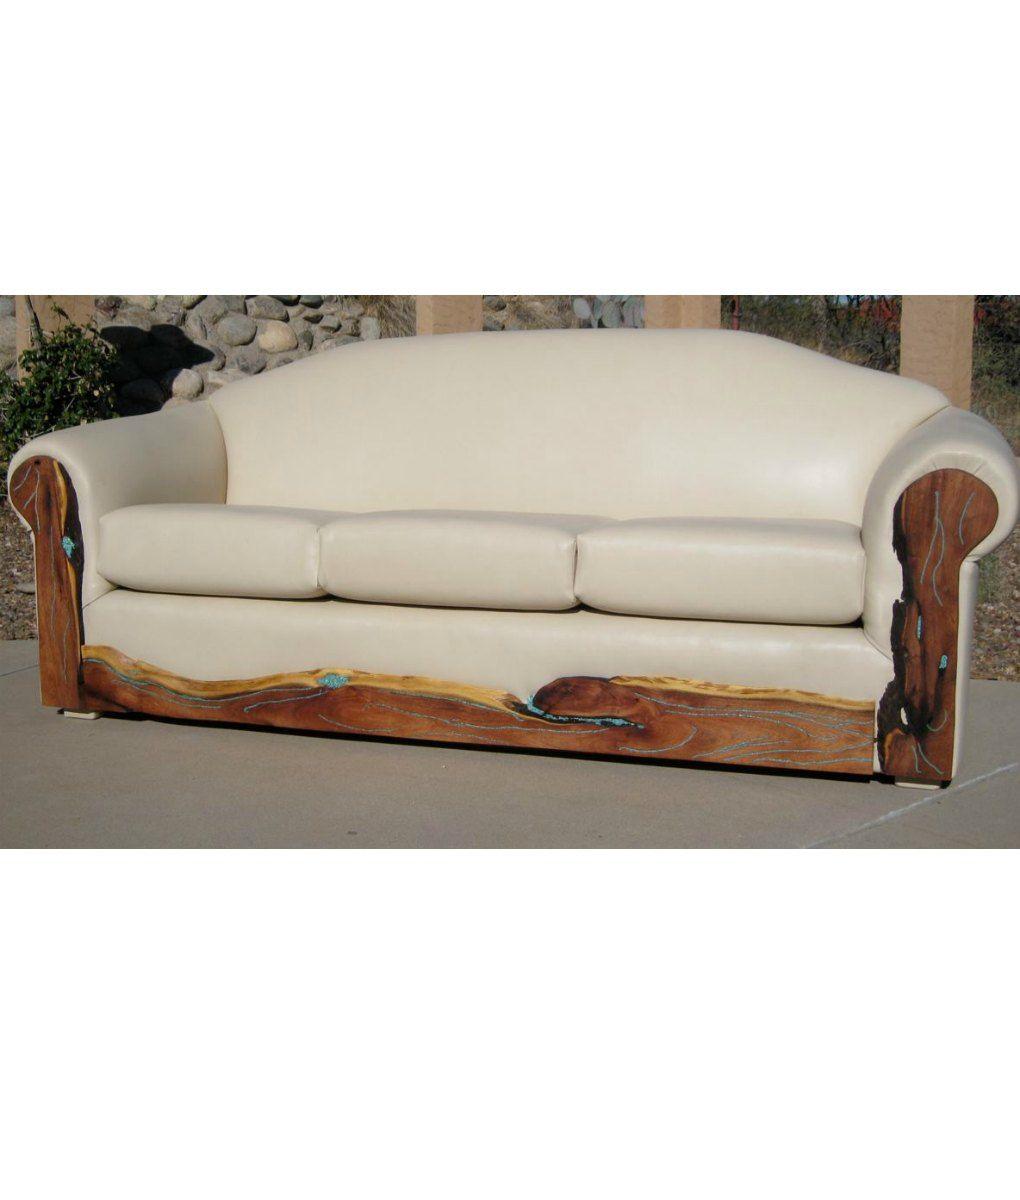 Turquoise Inlay Western Leather Sofa Pendleton Wool